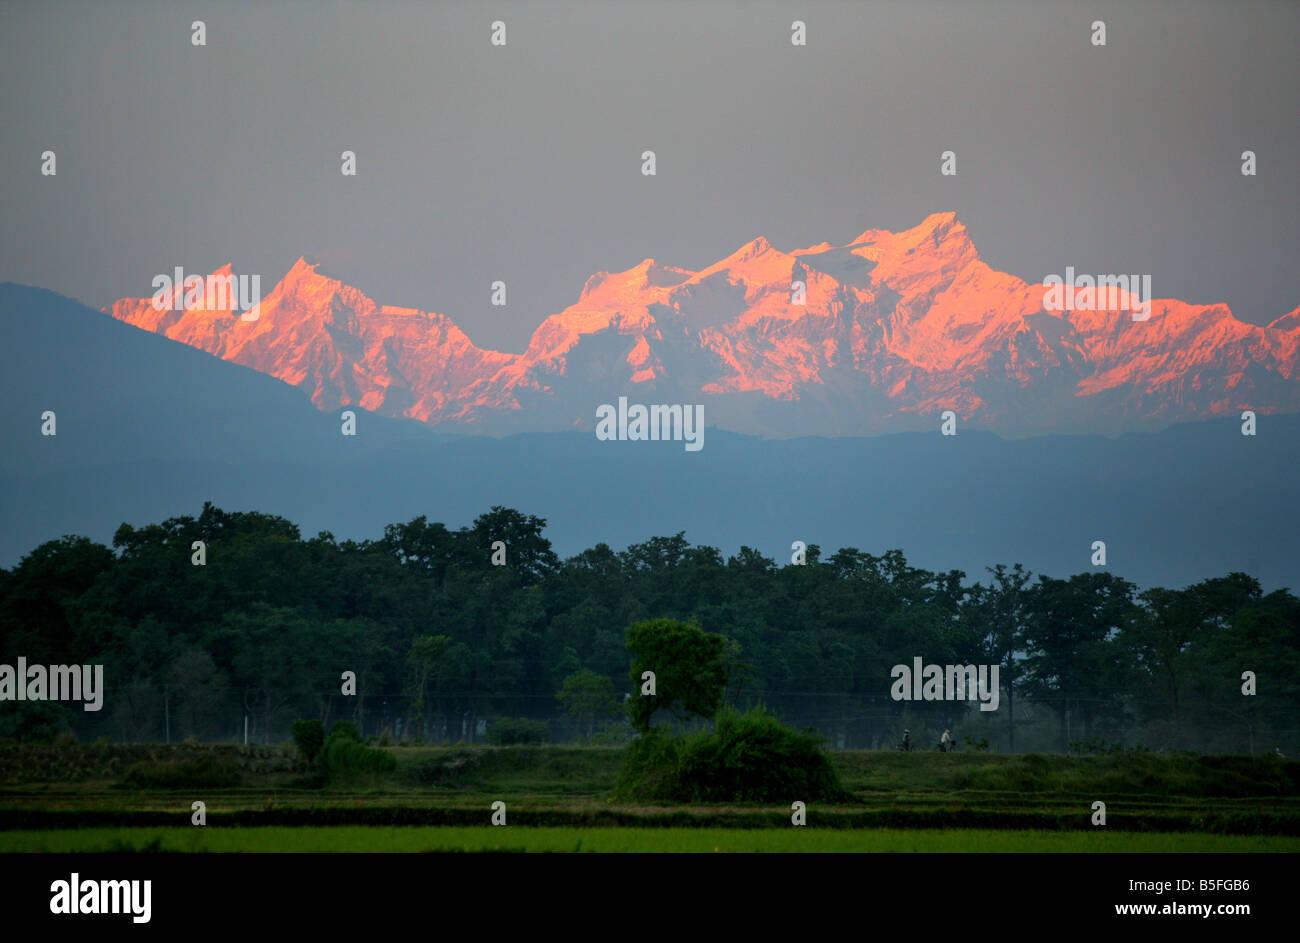 Nepal, Himalaya mountains - Stock Image